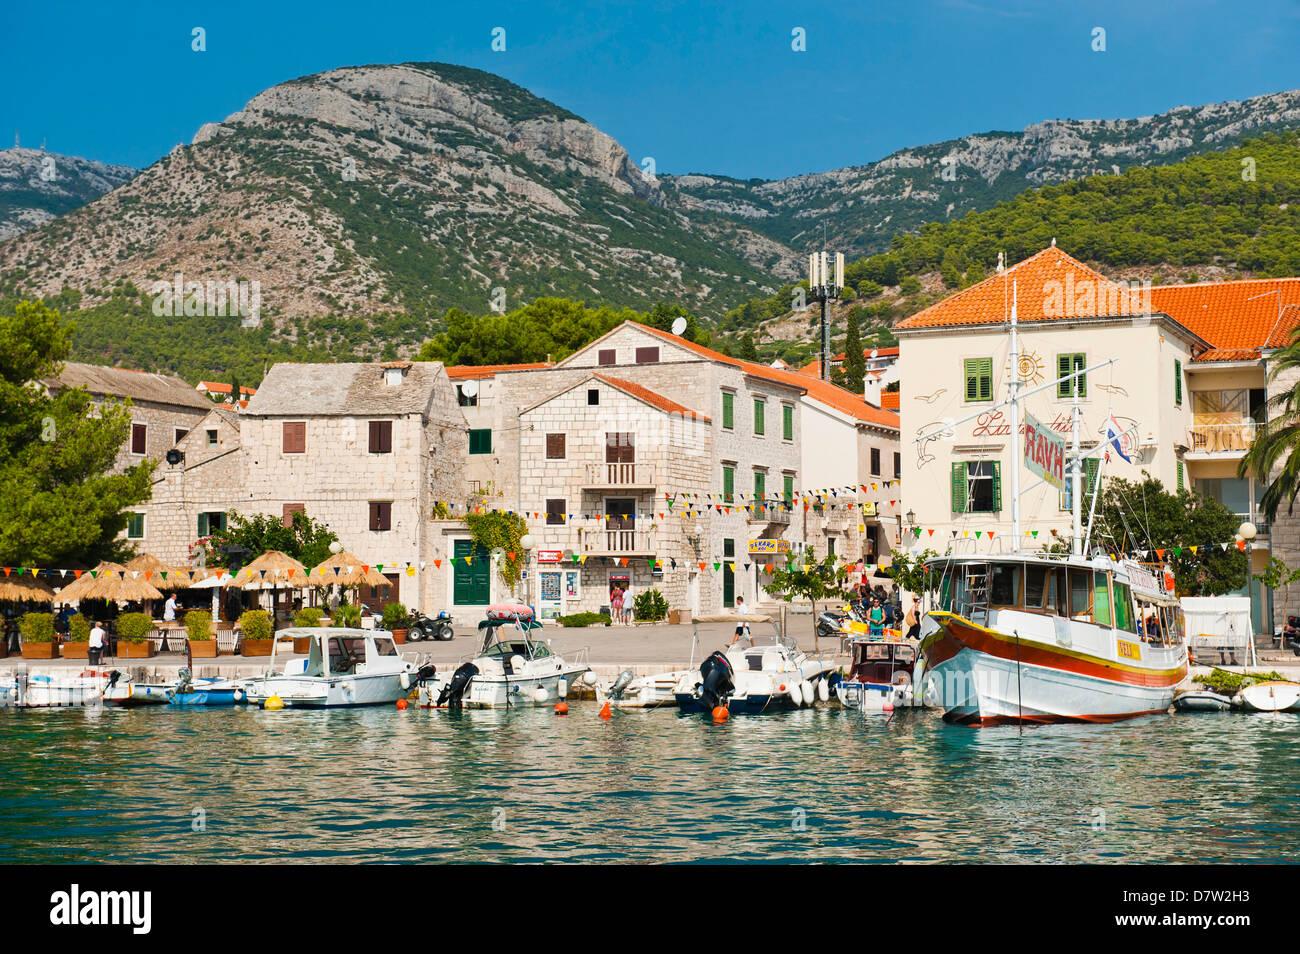 Bol Town, Brac Island, Dalmatian Coast, Adriatic, Croatia - Stock Image